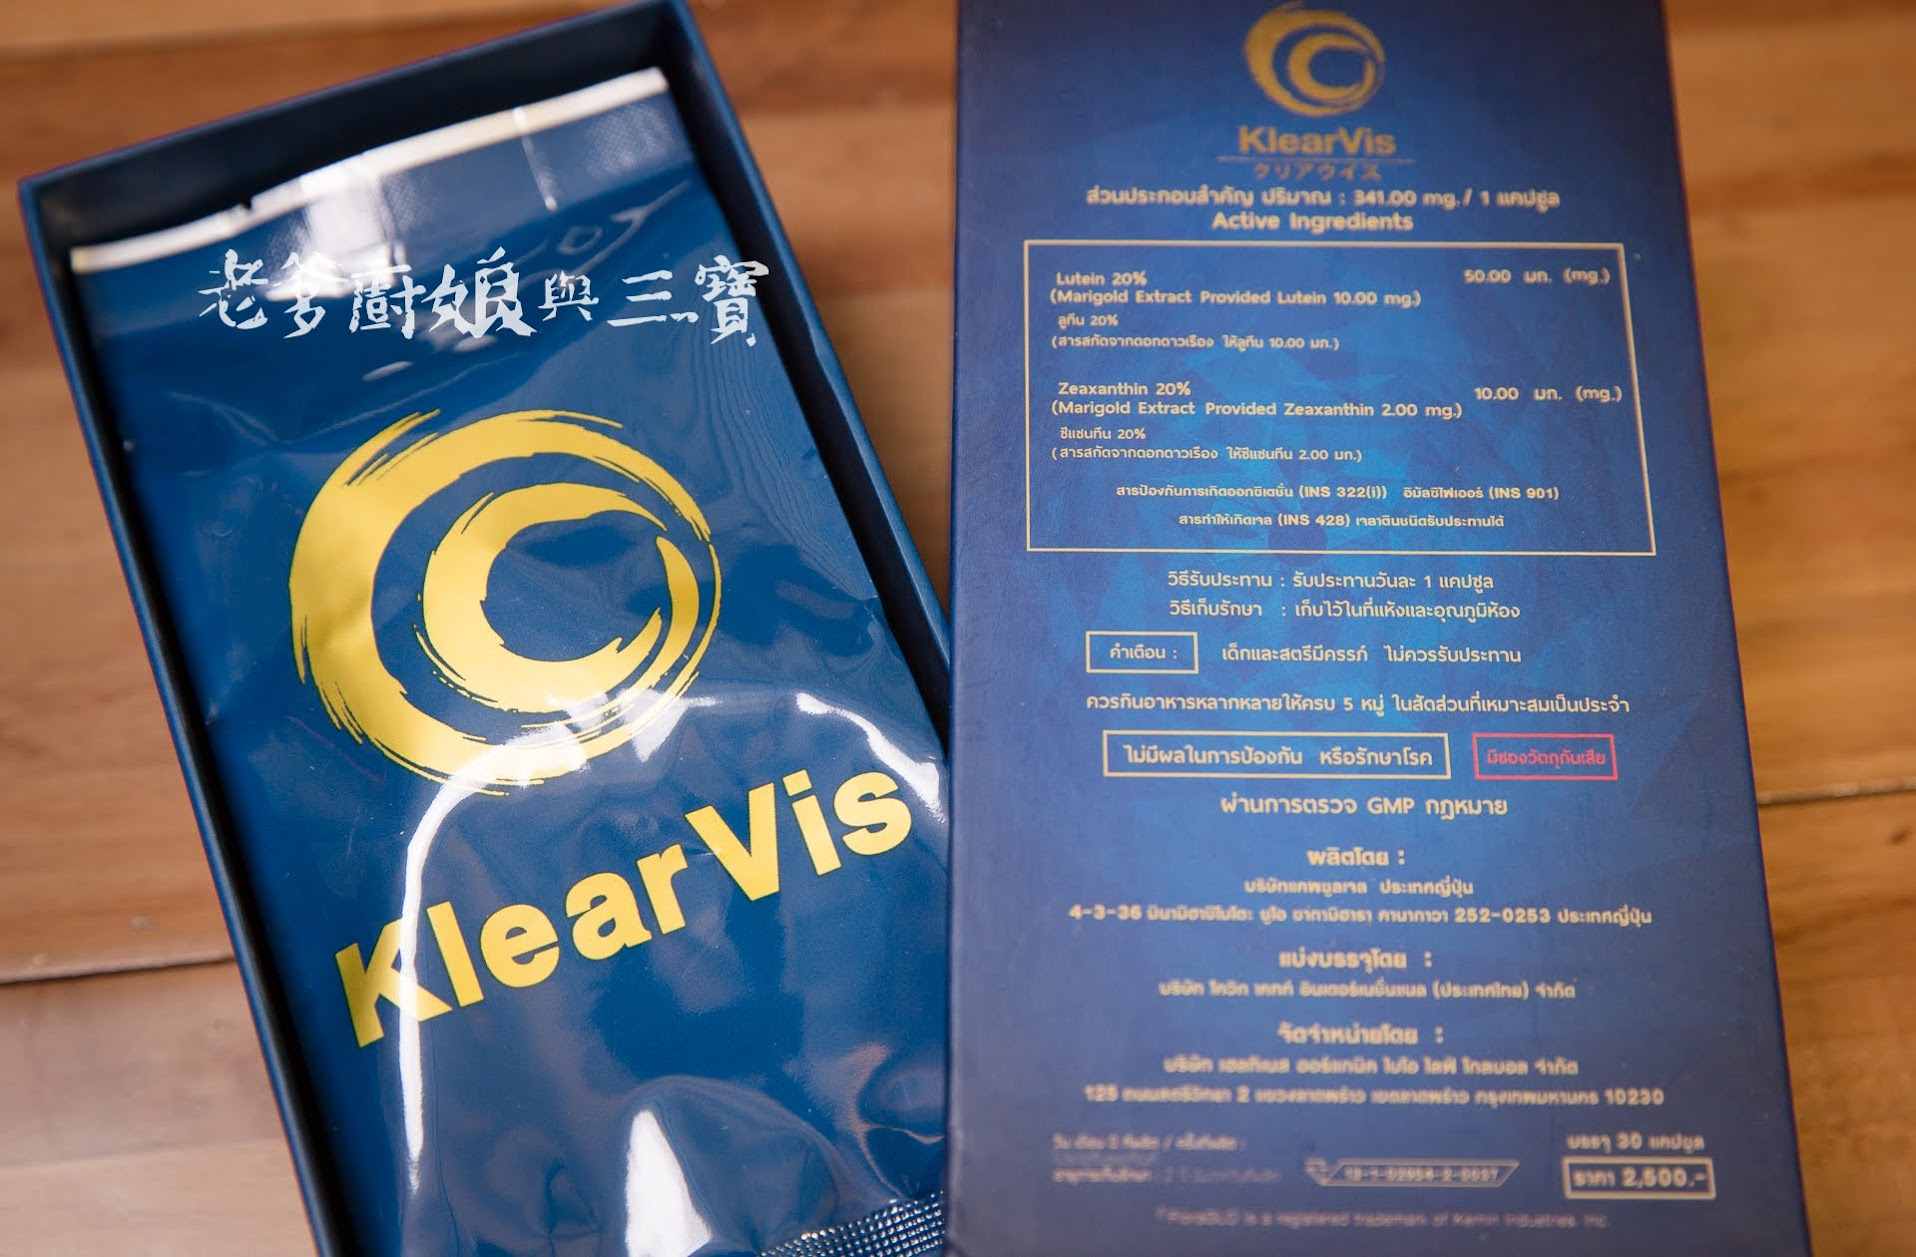 KLEARVIS營養補給...產自日本的葉黃素營養補充品,讓用眼過度的你遠離眼睛不適喔!